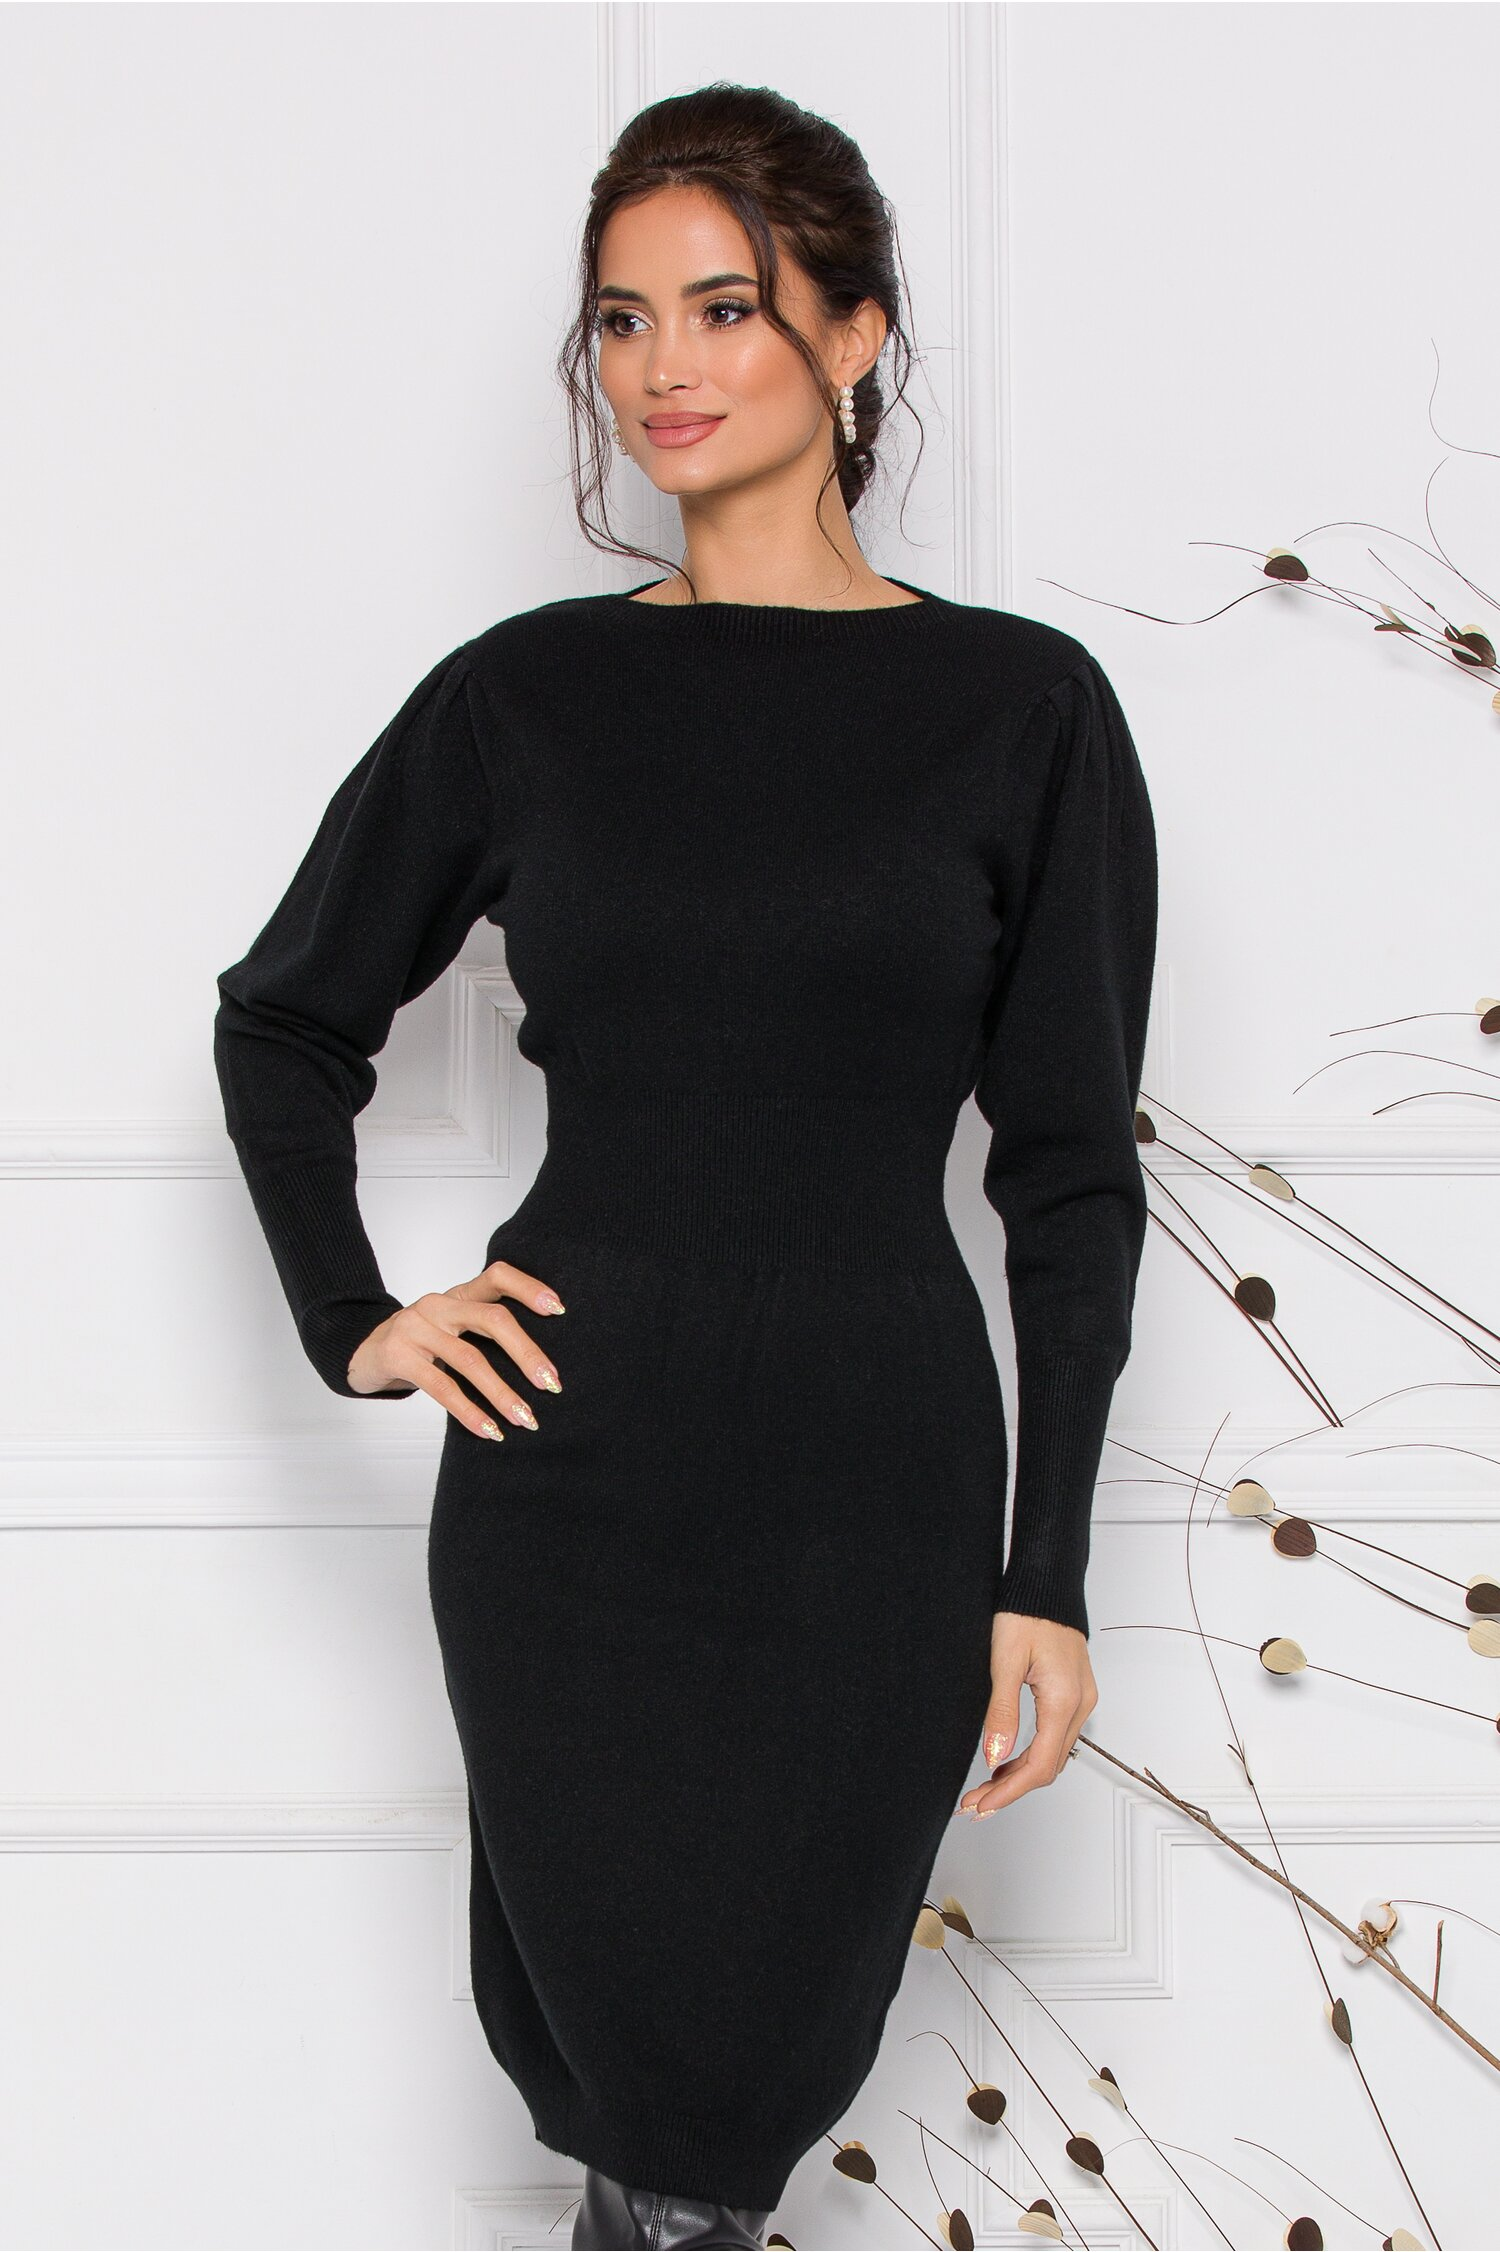 Rochie Ximo neagra din tricot cu talie marcata imagine